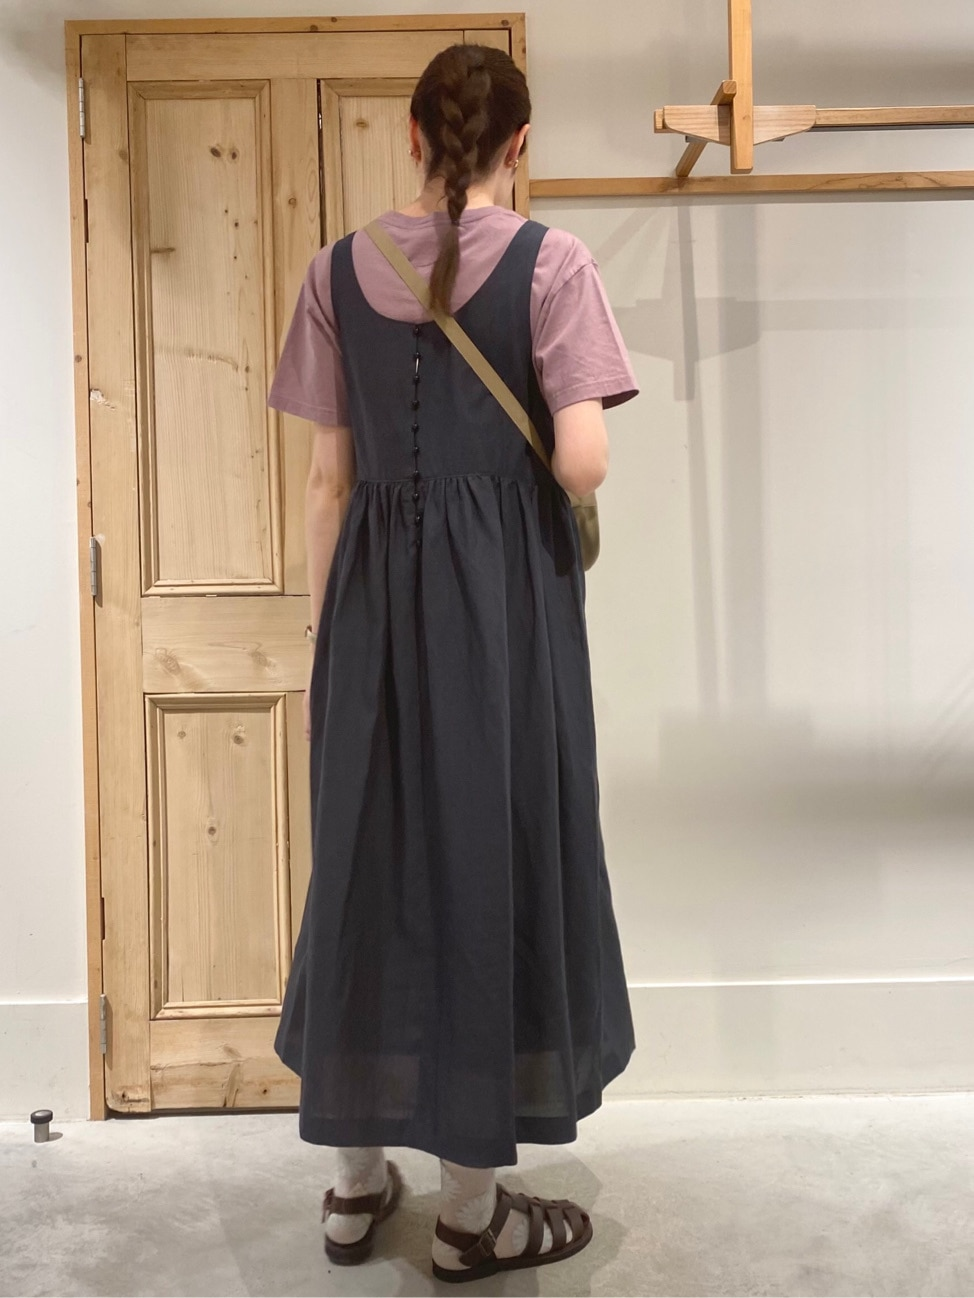 Malle chambre de charme 調布パルコ 身長:167cm 2021.05.02